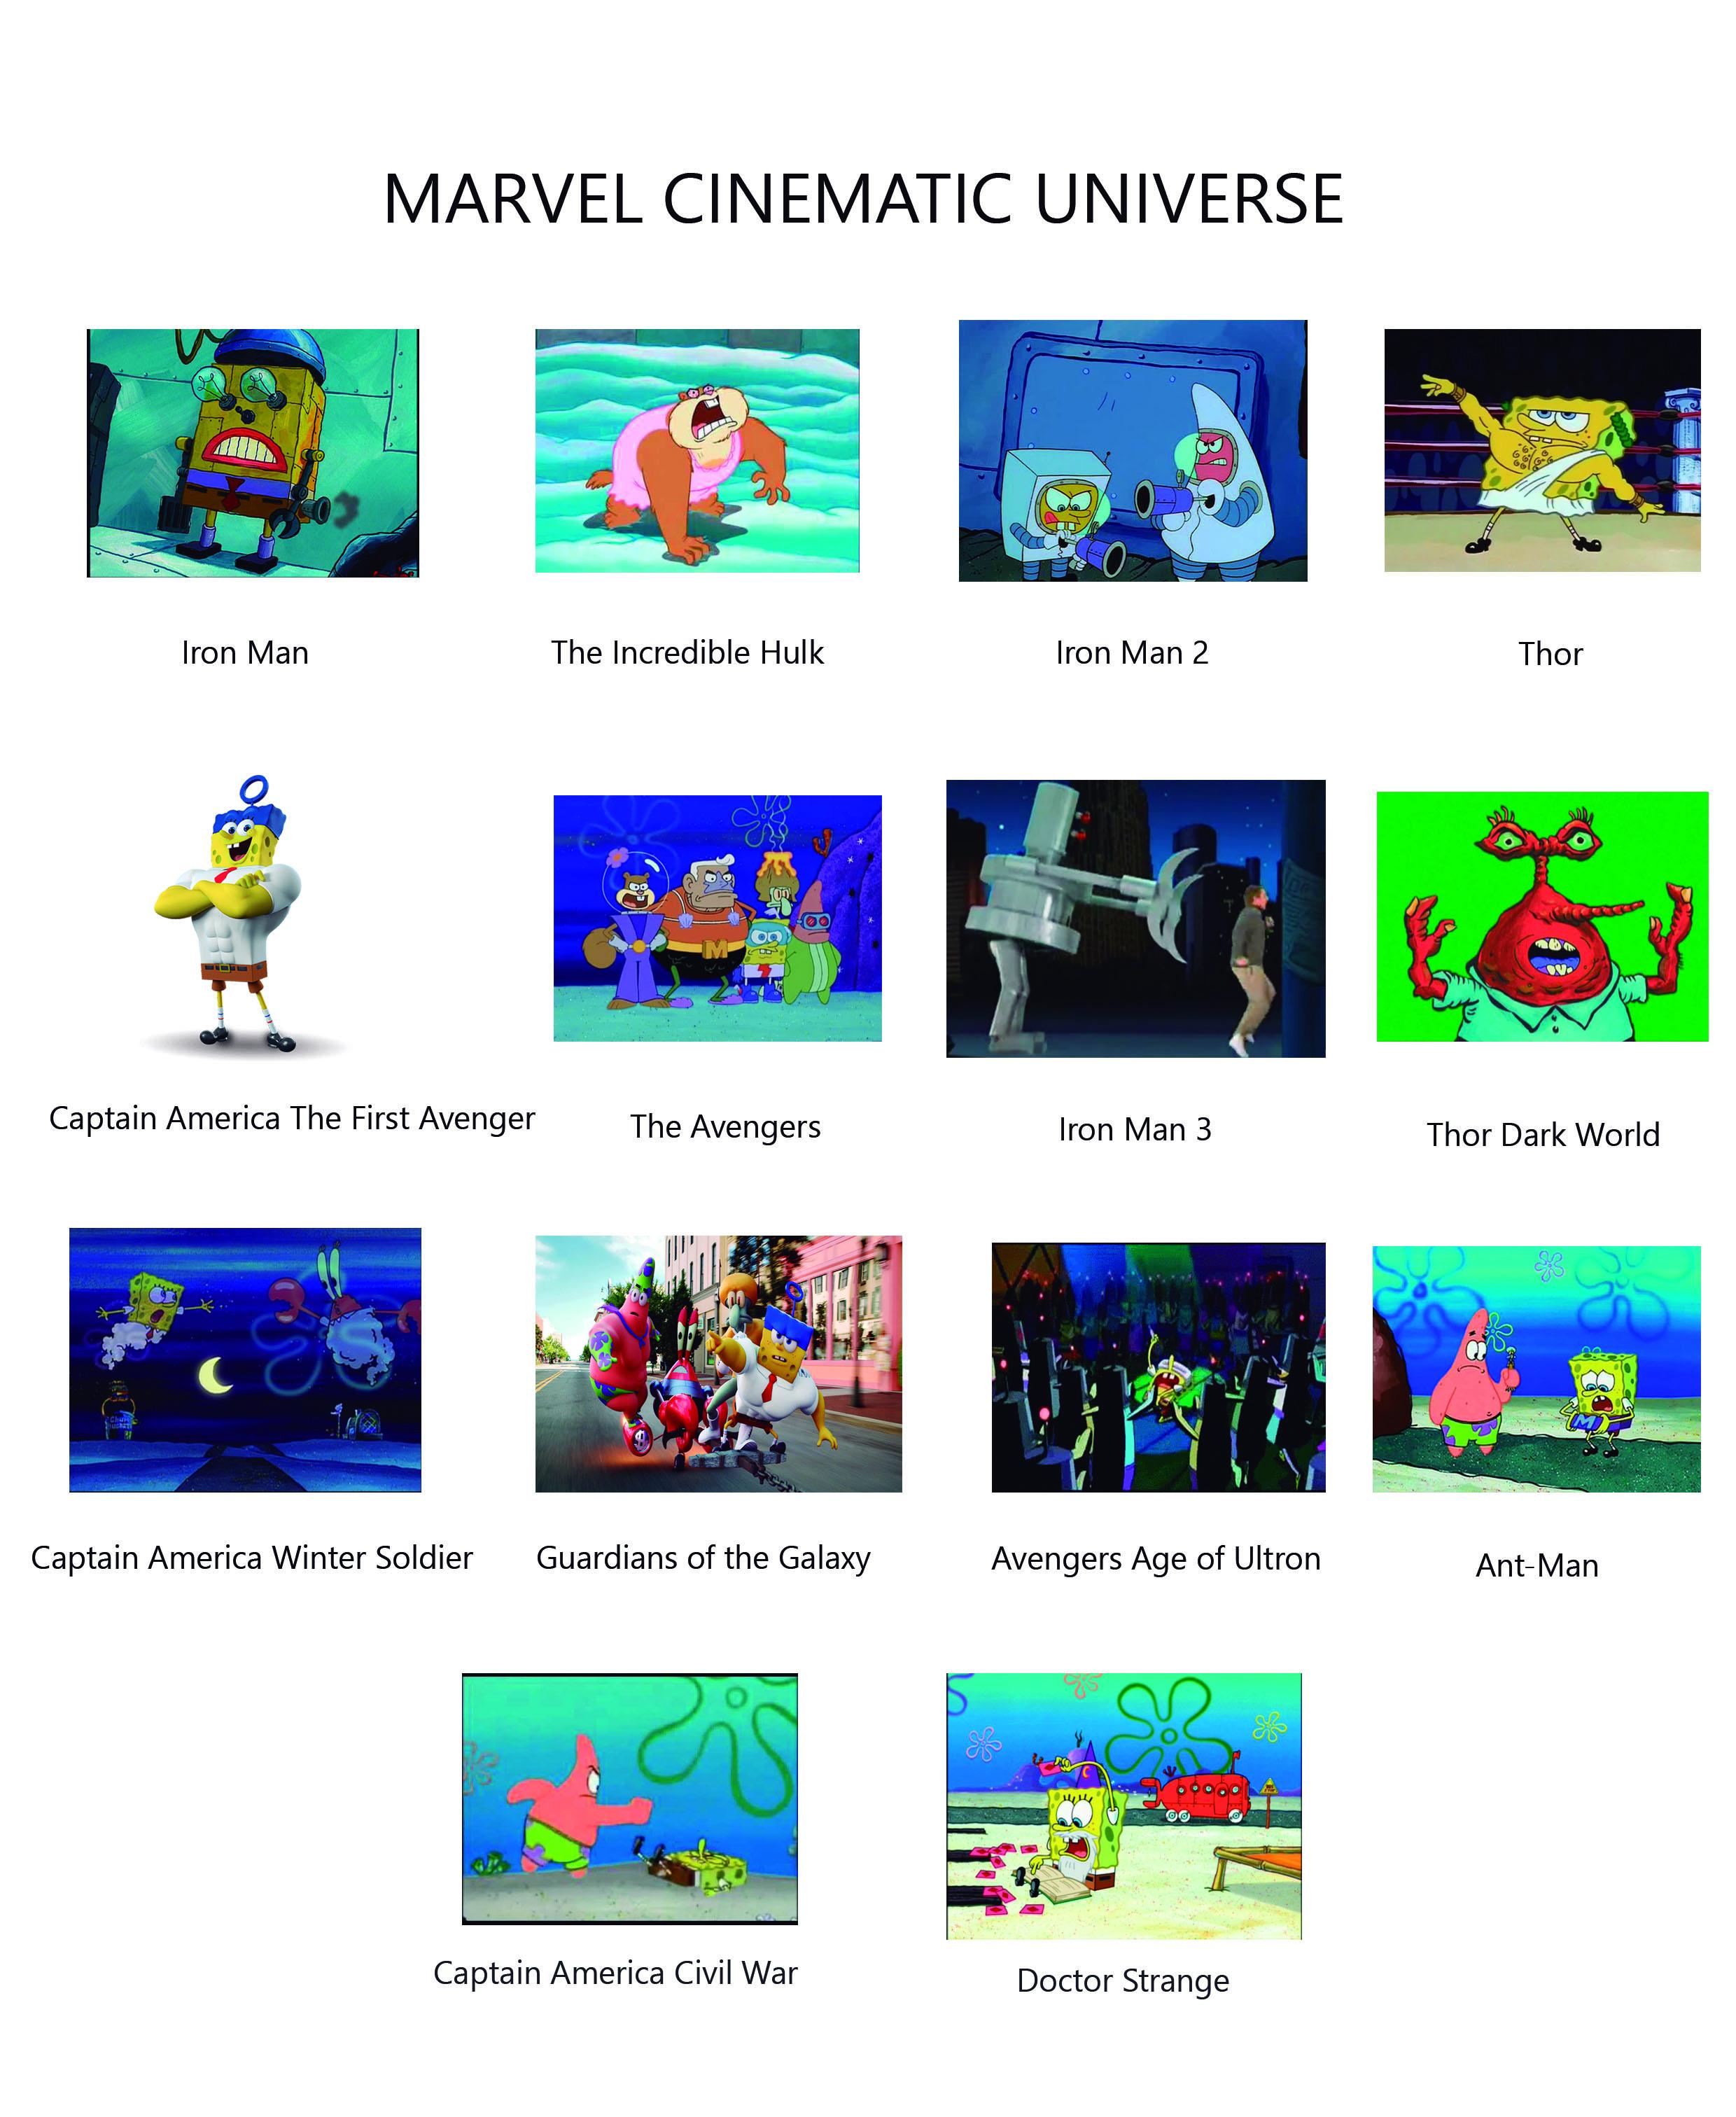 Marvel cinematic universe iron man iron man2 thor captain america the first avenger the avengers iron